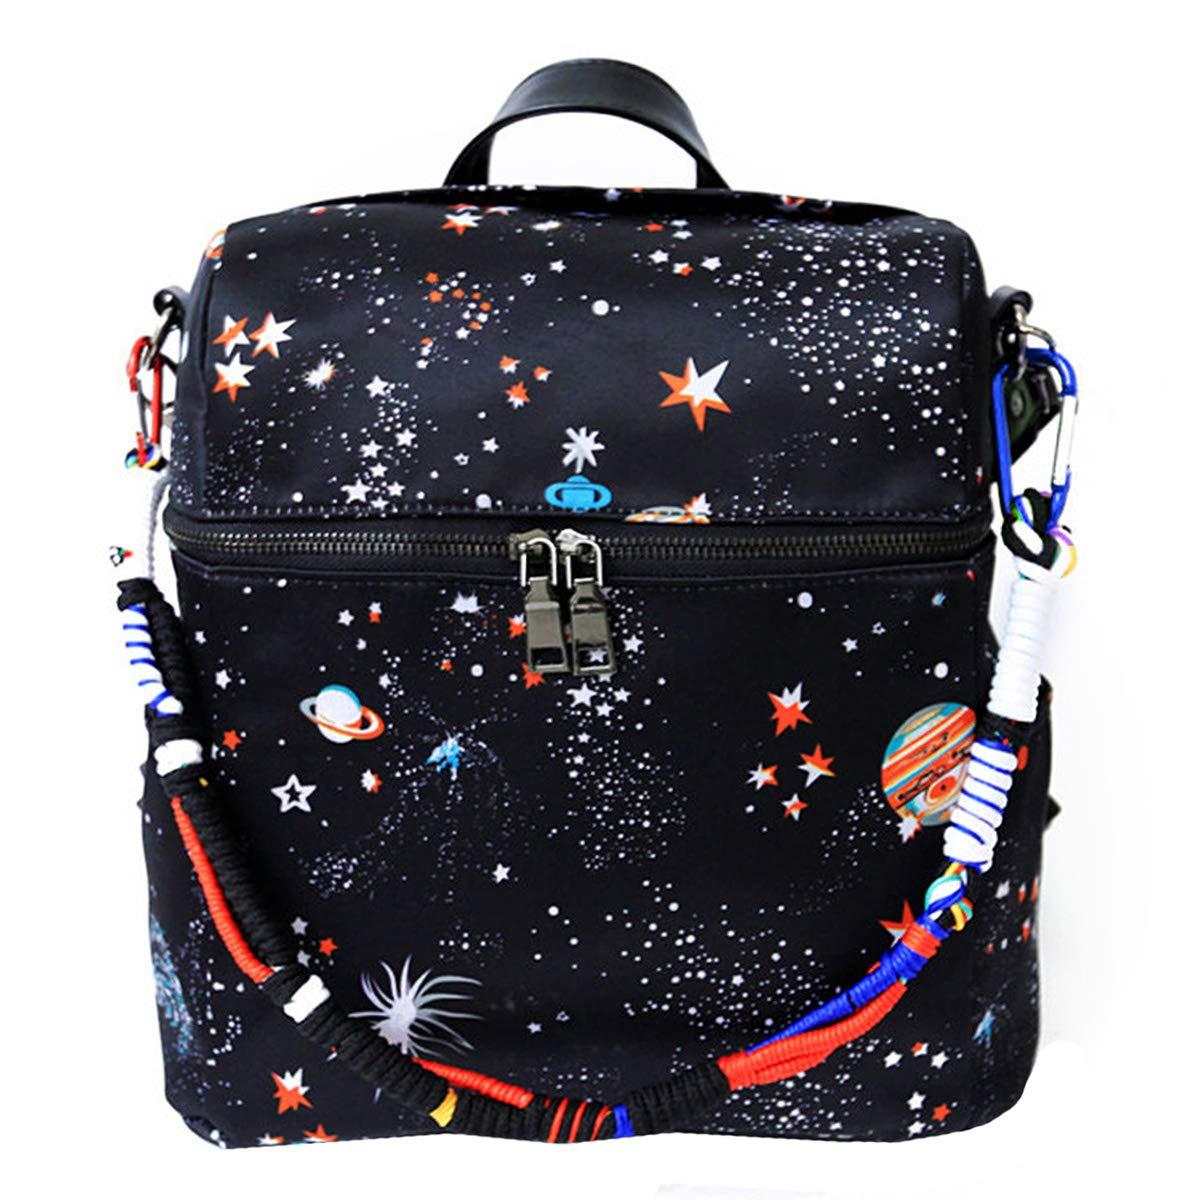 Van Caro Backpack - Multifunction Daypack Casual Travel Hiking Bag Shoulder bag Bookbag for Girls(Black)